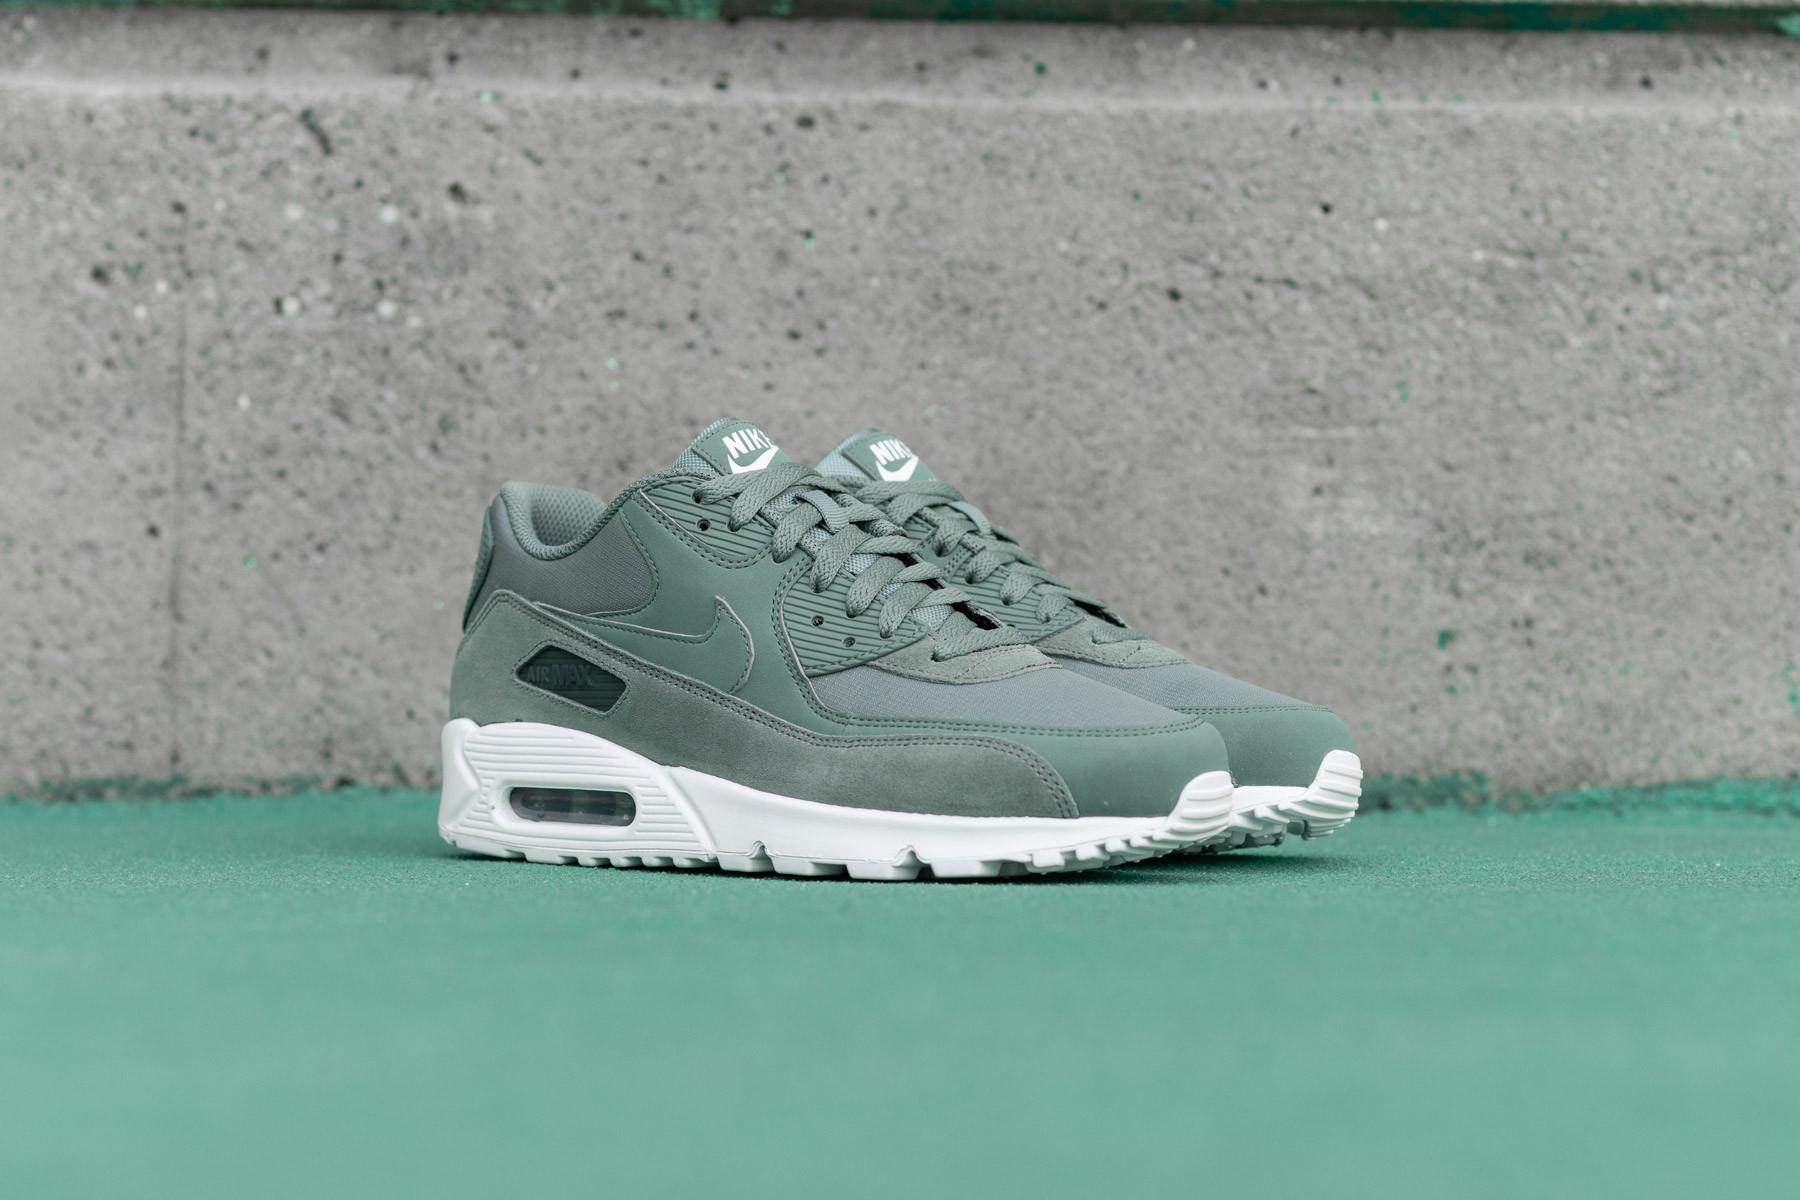 Nike Air Max 95 Premium | Grønn | Sneakers | 538416 300